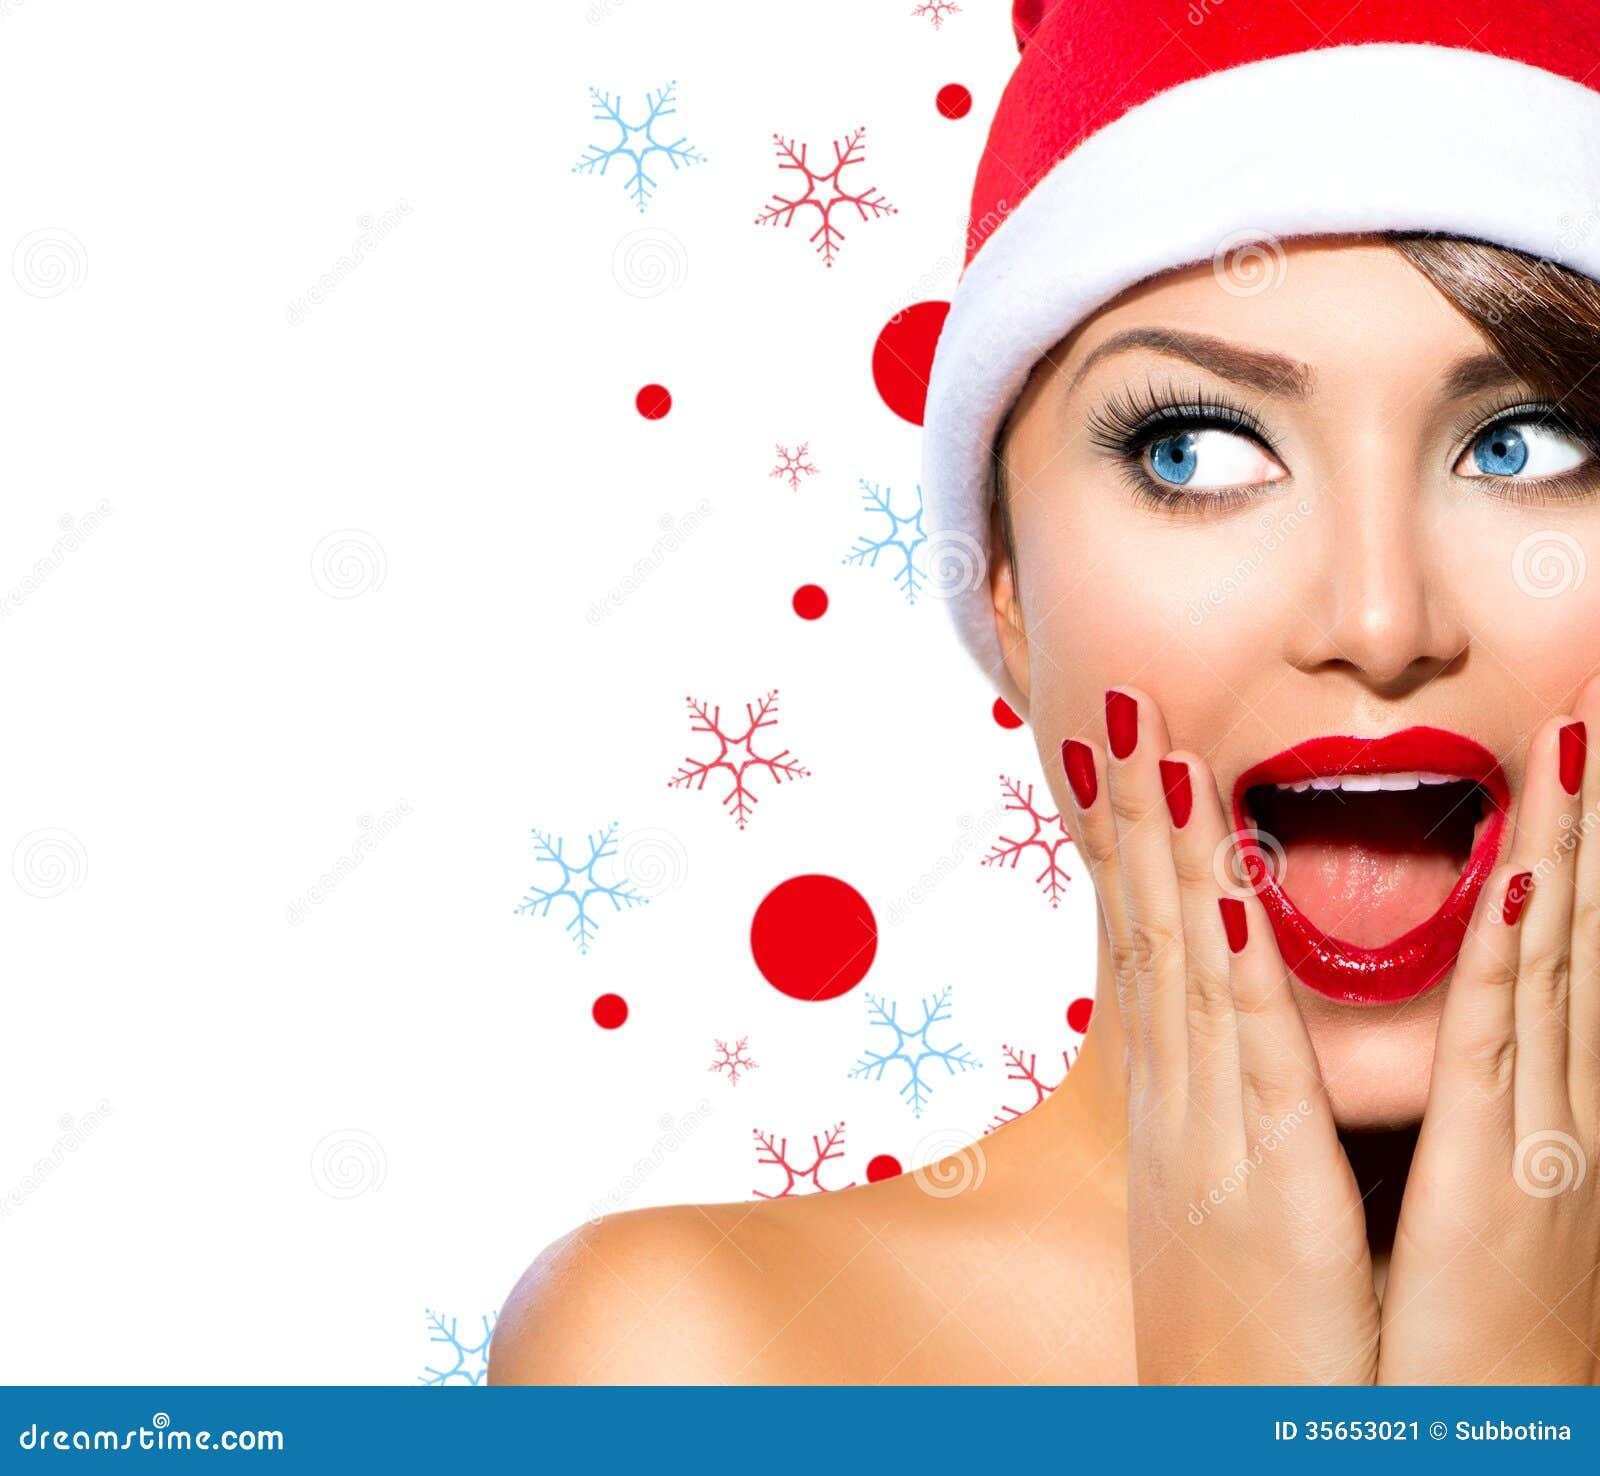 Fashion Beauty Model Girl Stock Image Image Of Manicured: Christmas Woman Stock Image